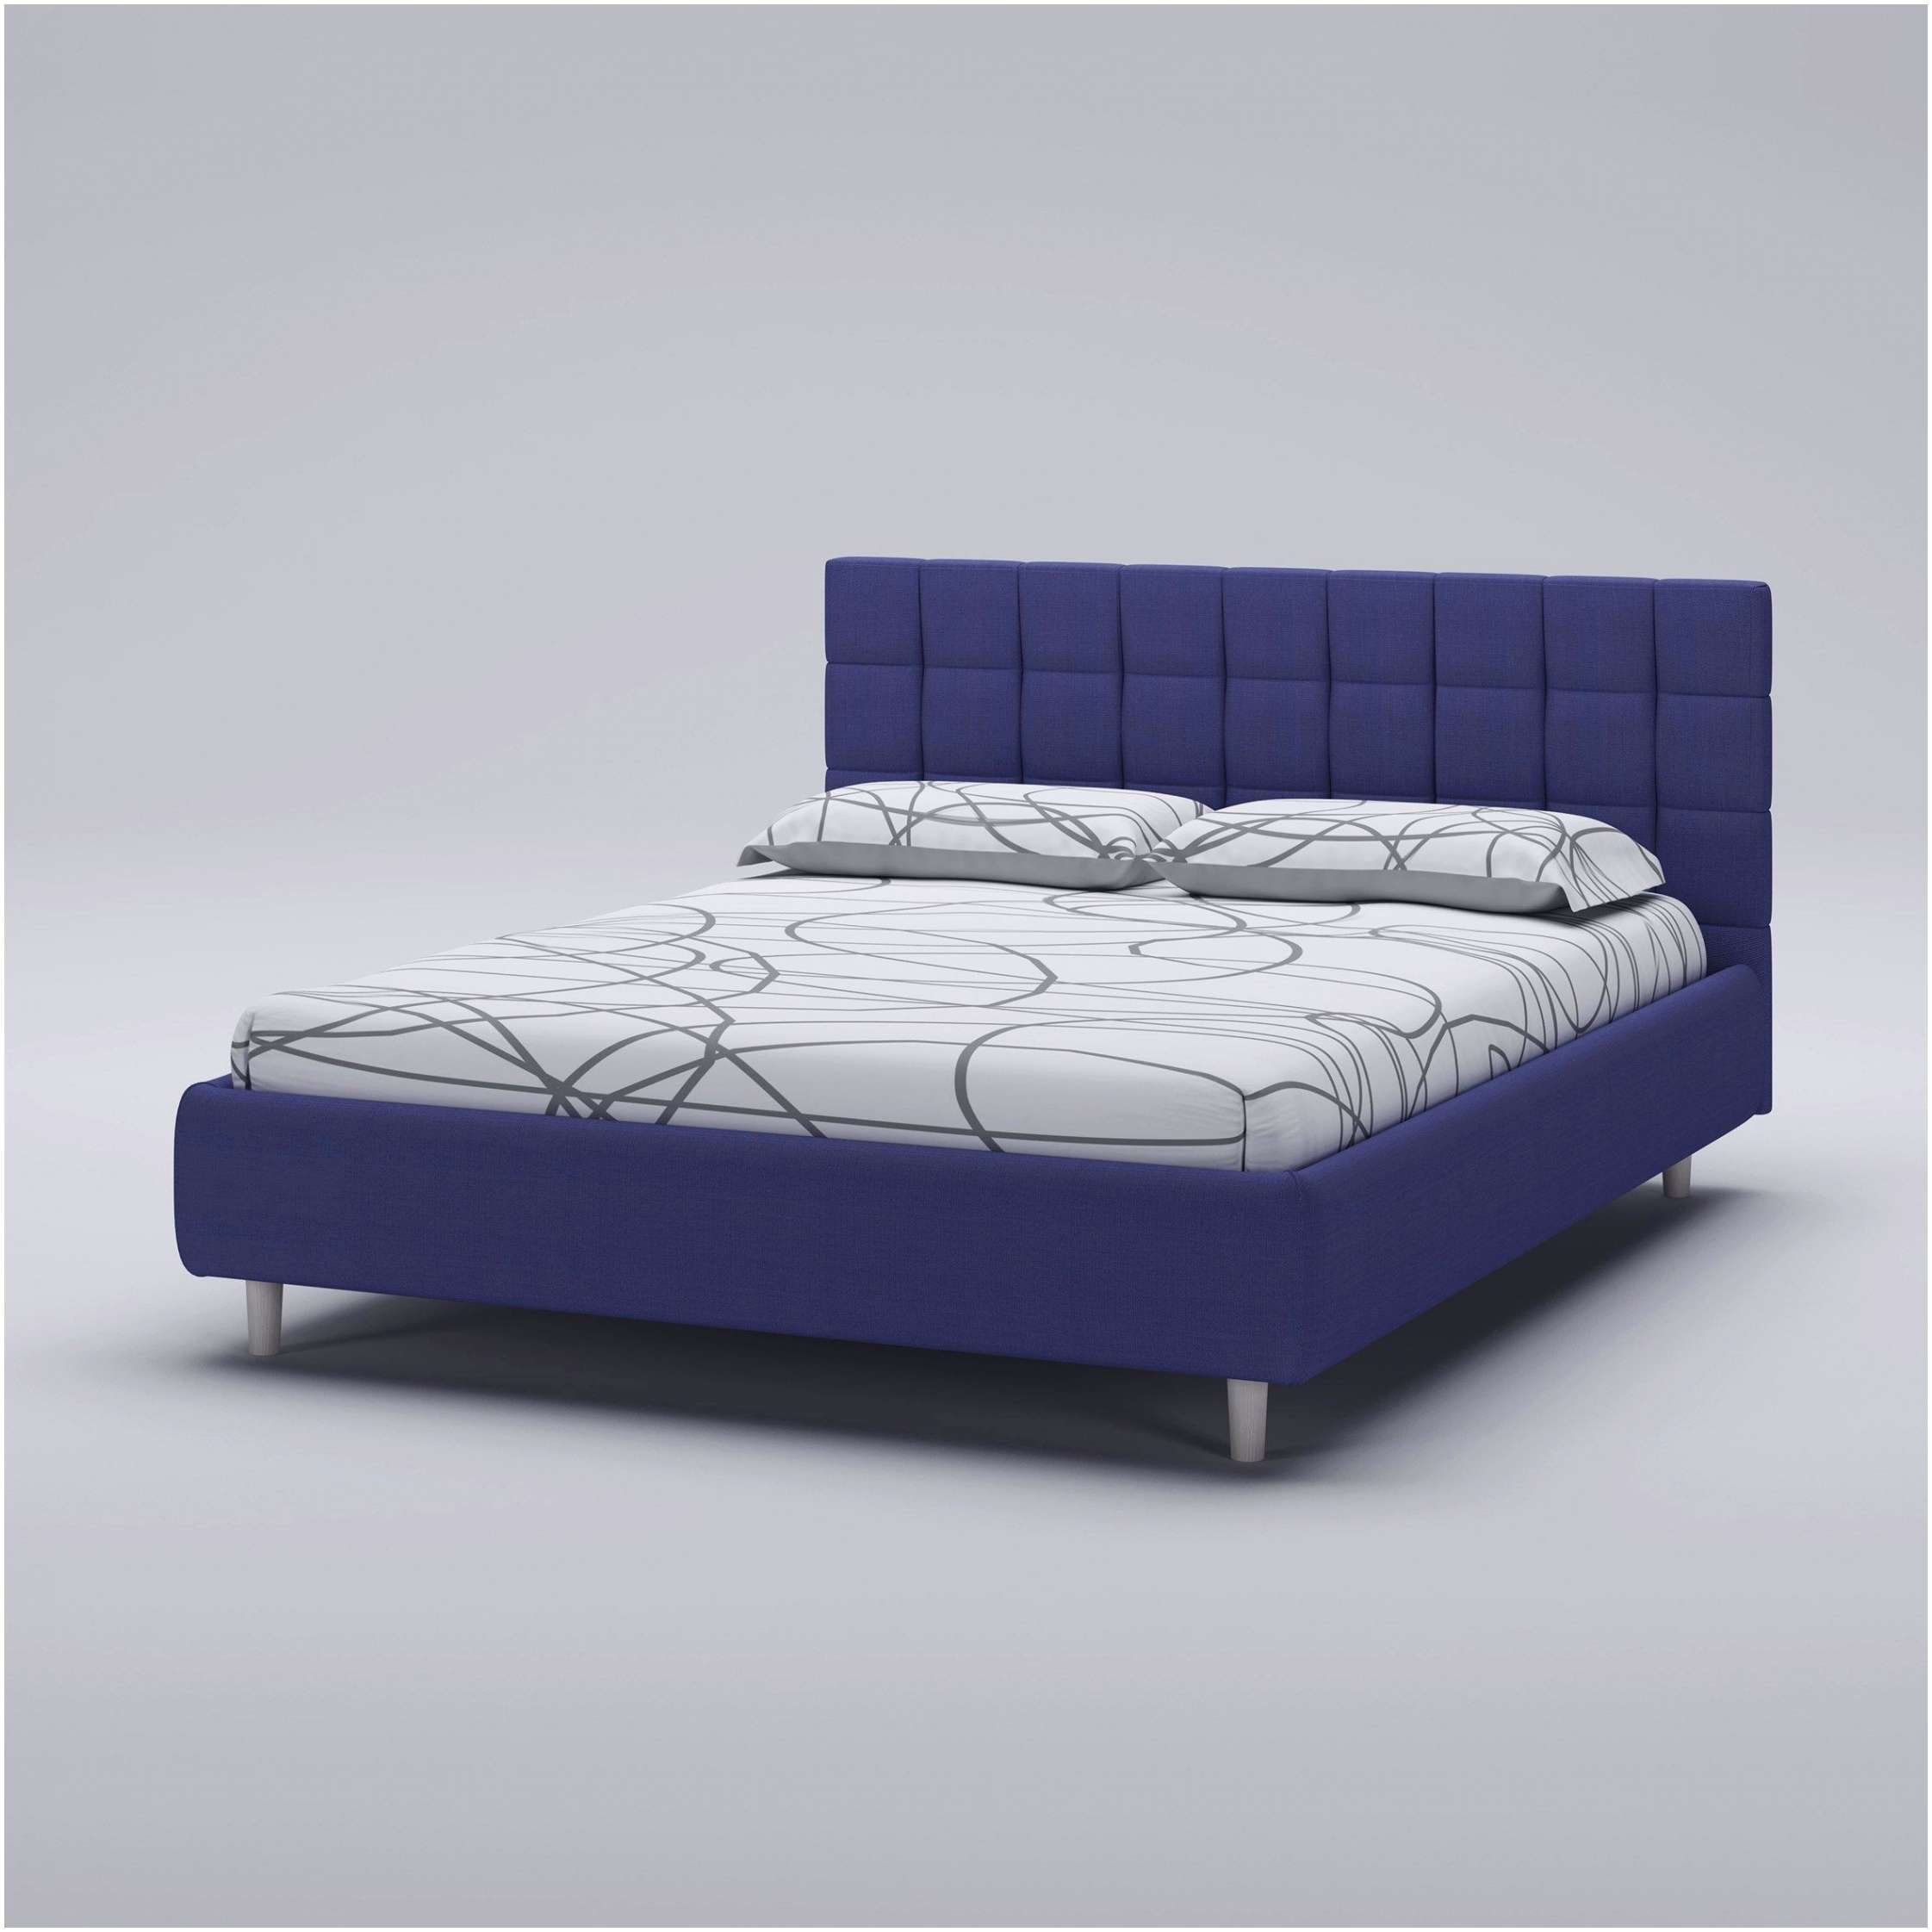 Impressionnant Ikea Bedden 160 X 200 Luxe Bett Ikea 200—200 Schön